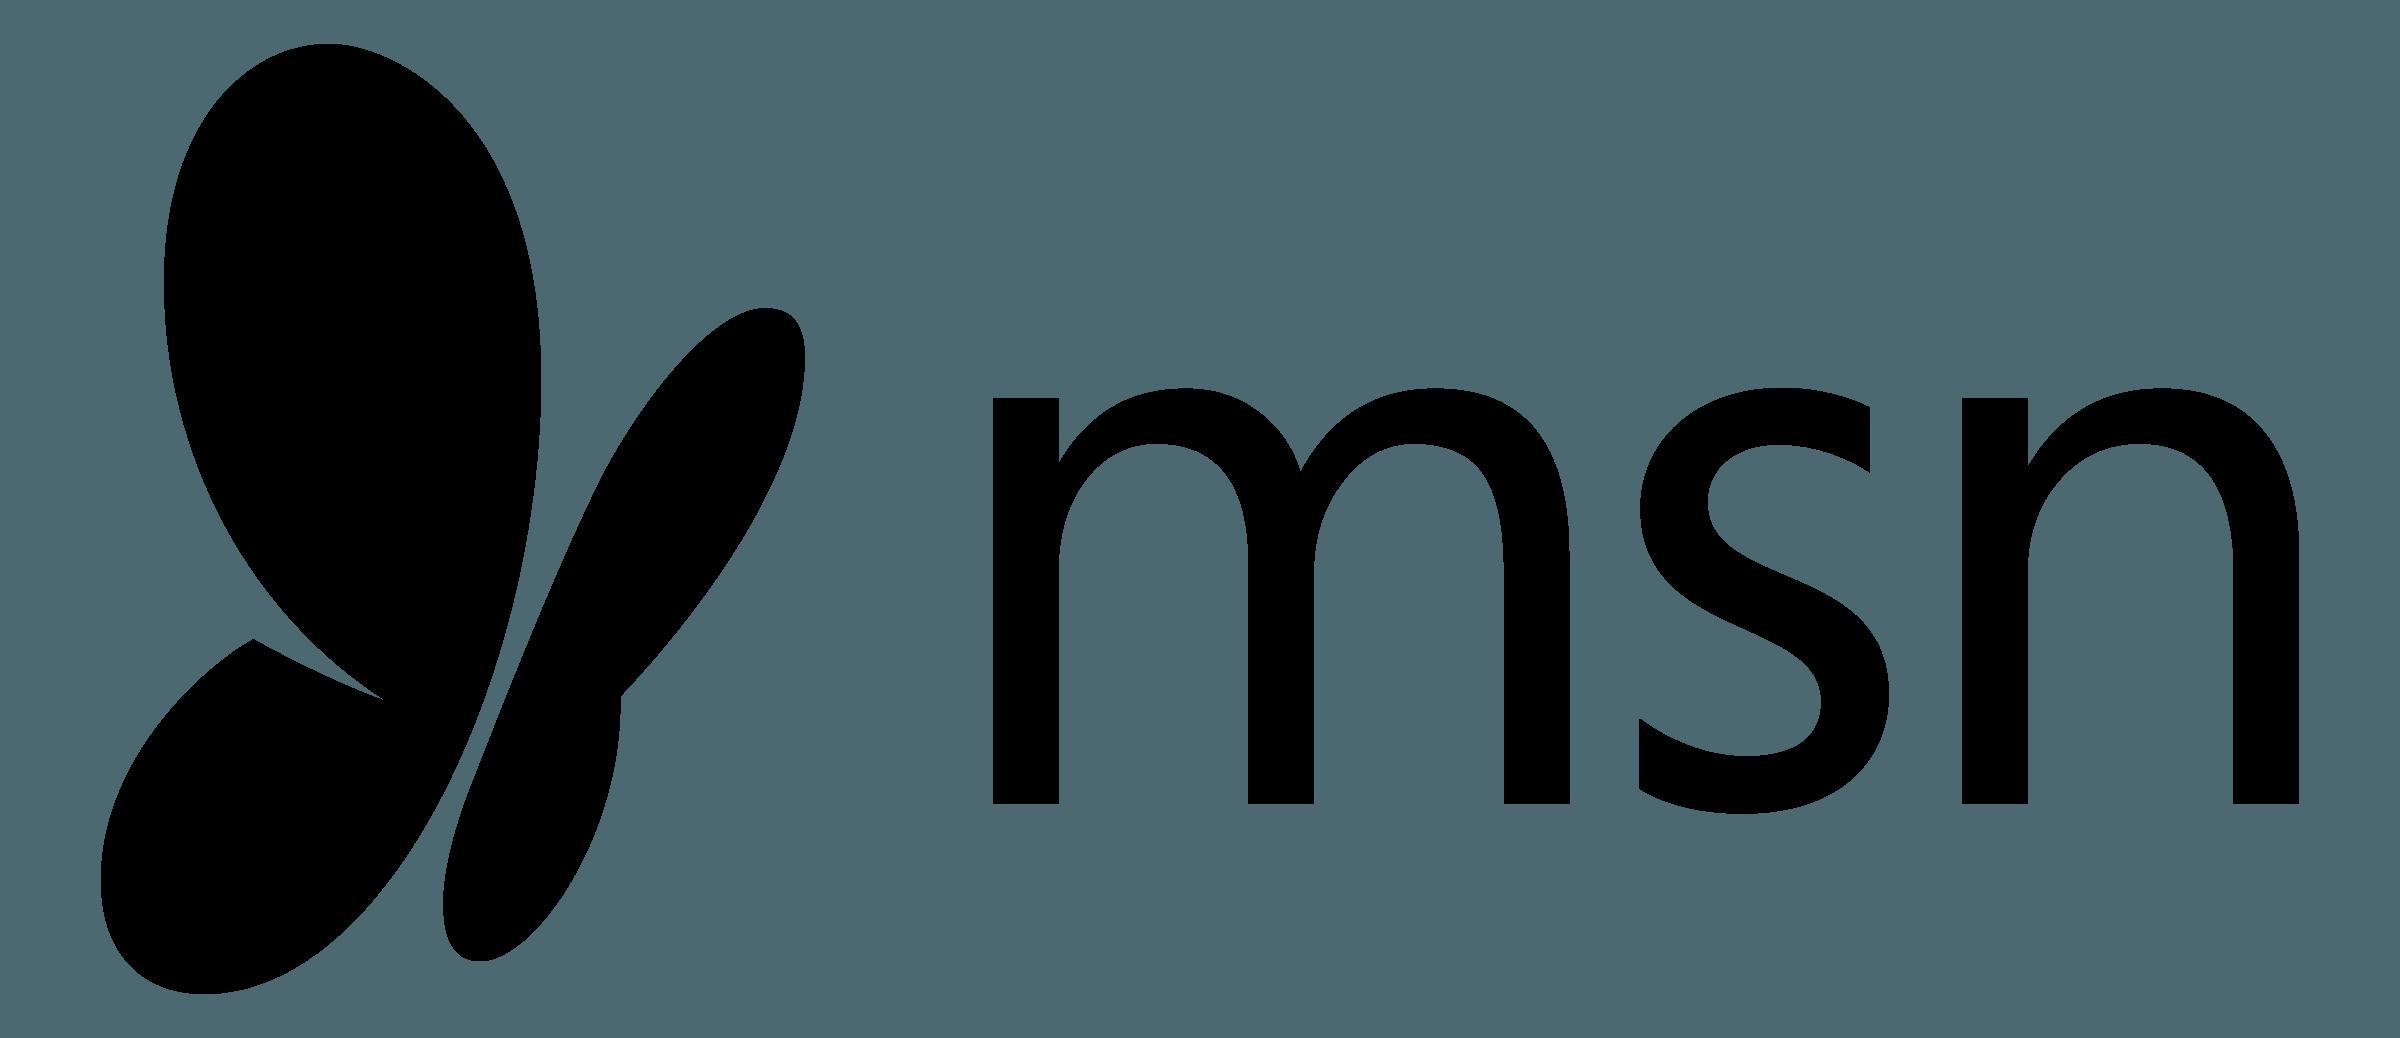 Msn logo transparent